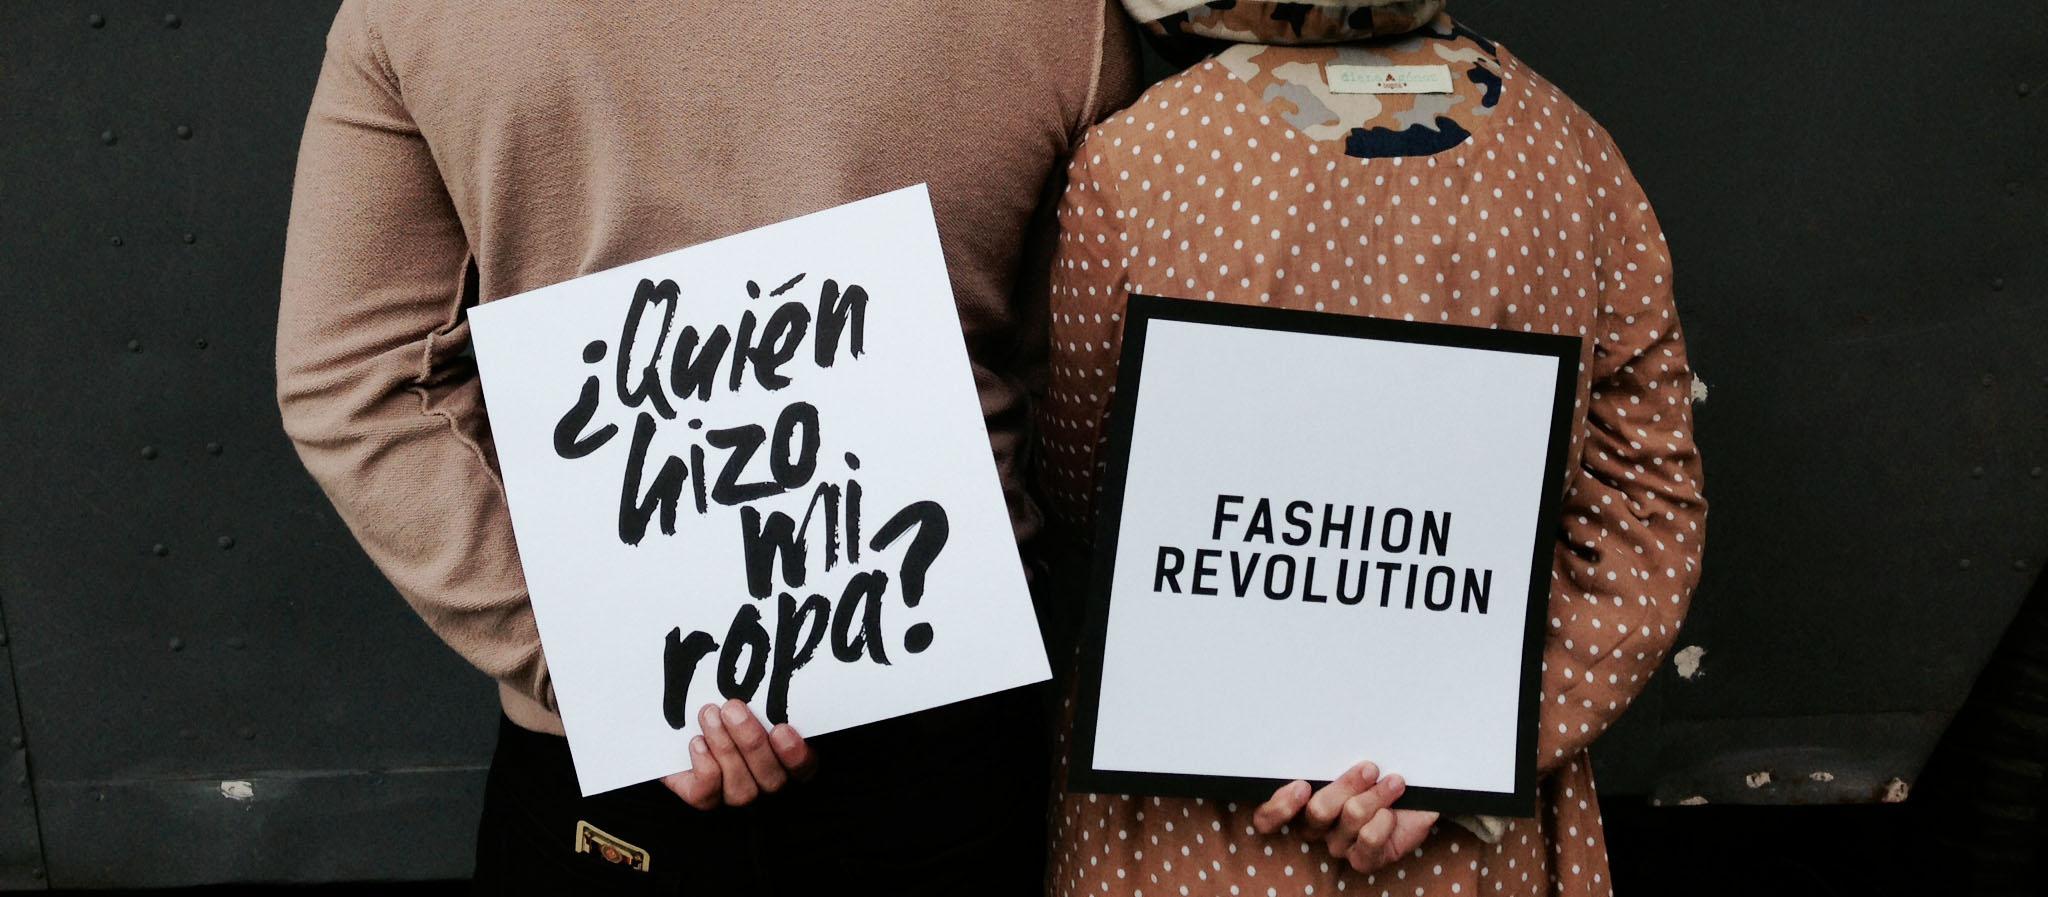 [Image: Pagina/fashionrevolution.org]